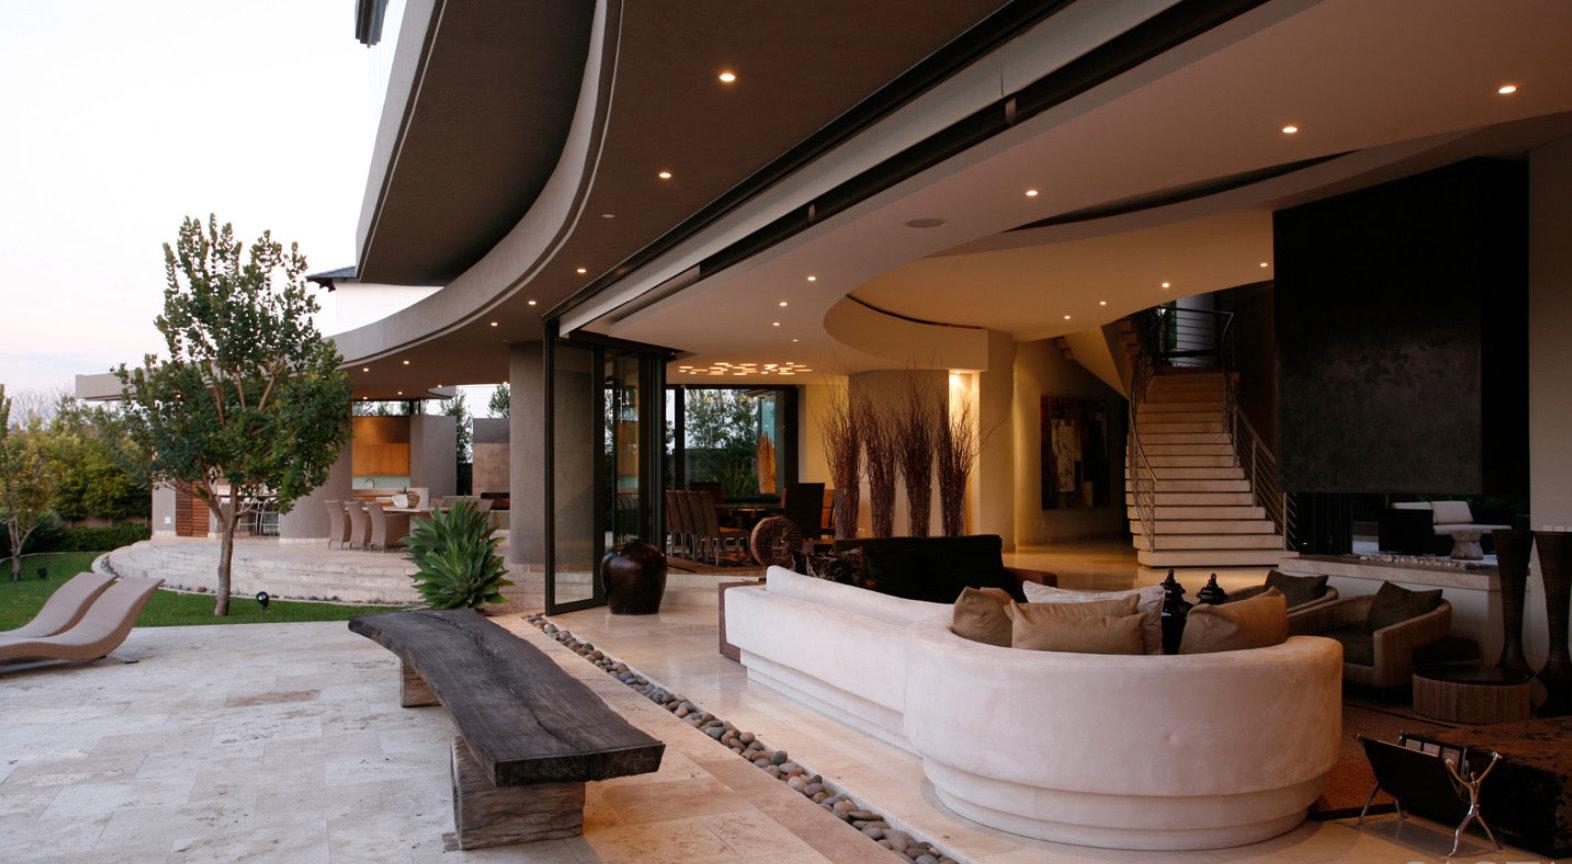 P t sz bels p t sz blog beautyful modern luxory for Complete house interior design